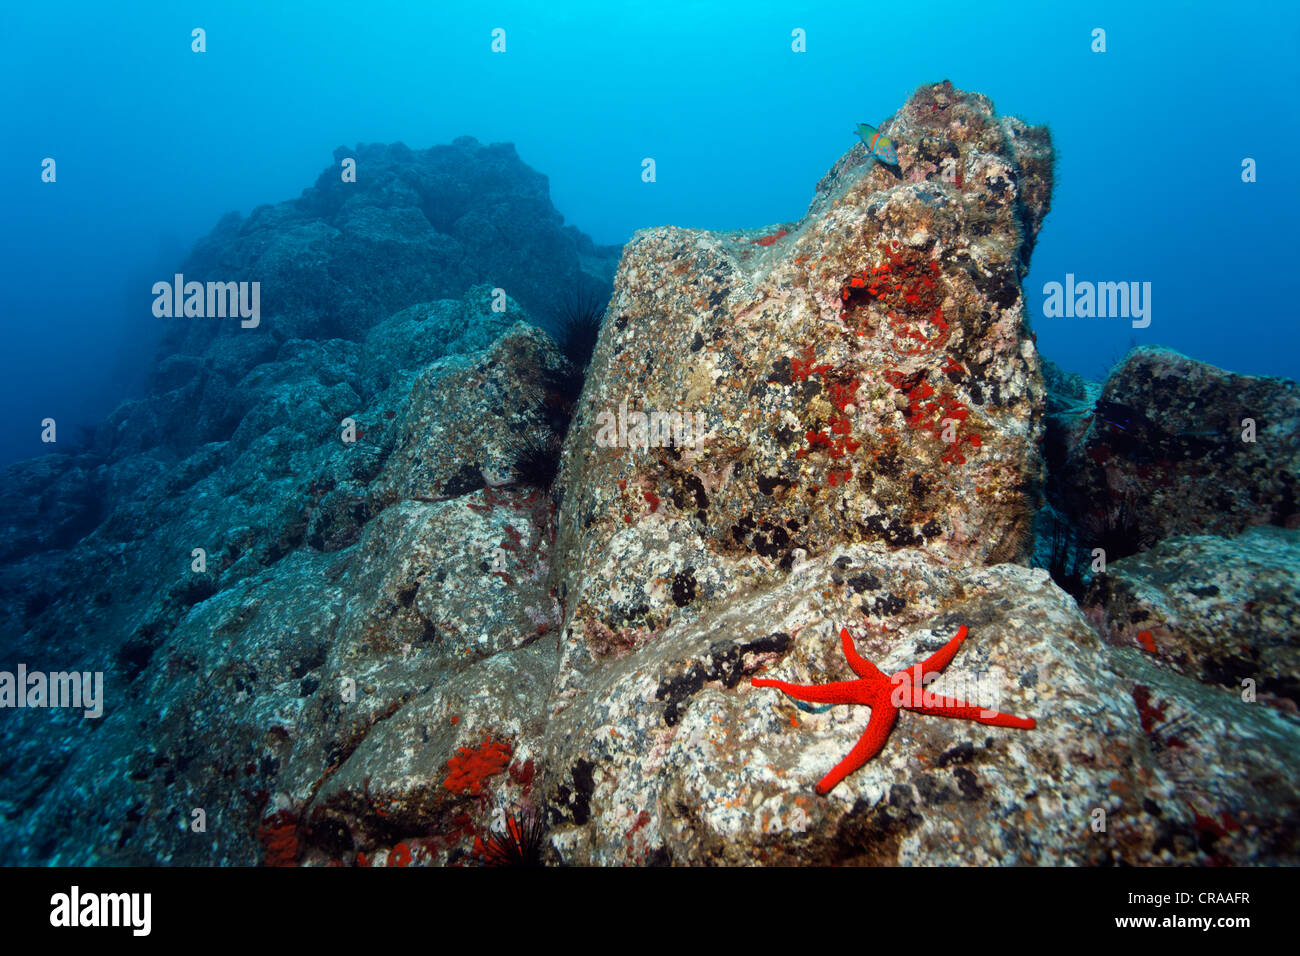 Paisajes submarinos rocosos, Estrella de mar roja (Echinaster sepositus), Acorn percebes (Balanus trigonus), Madeira, Portugal, Europa Foto de stock